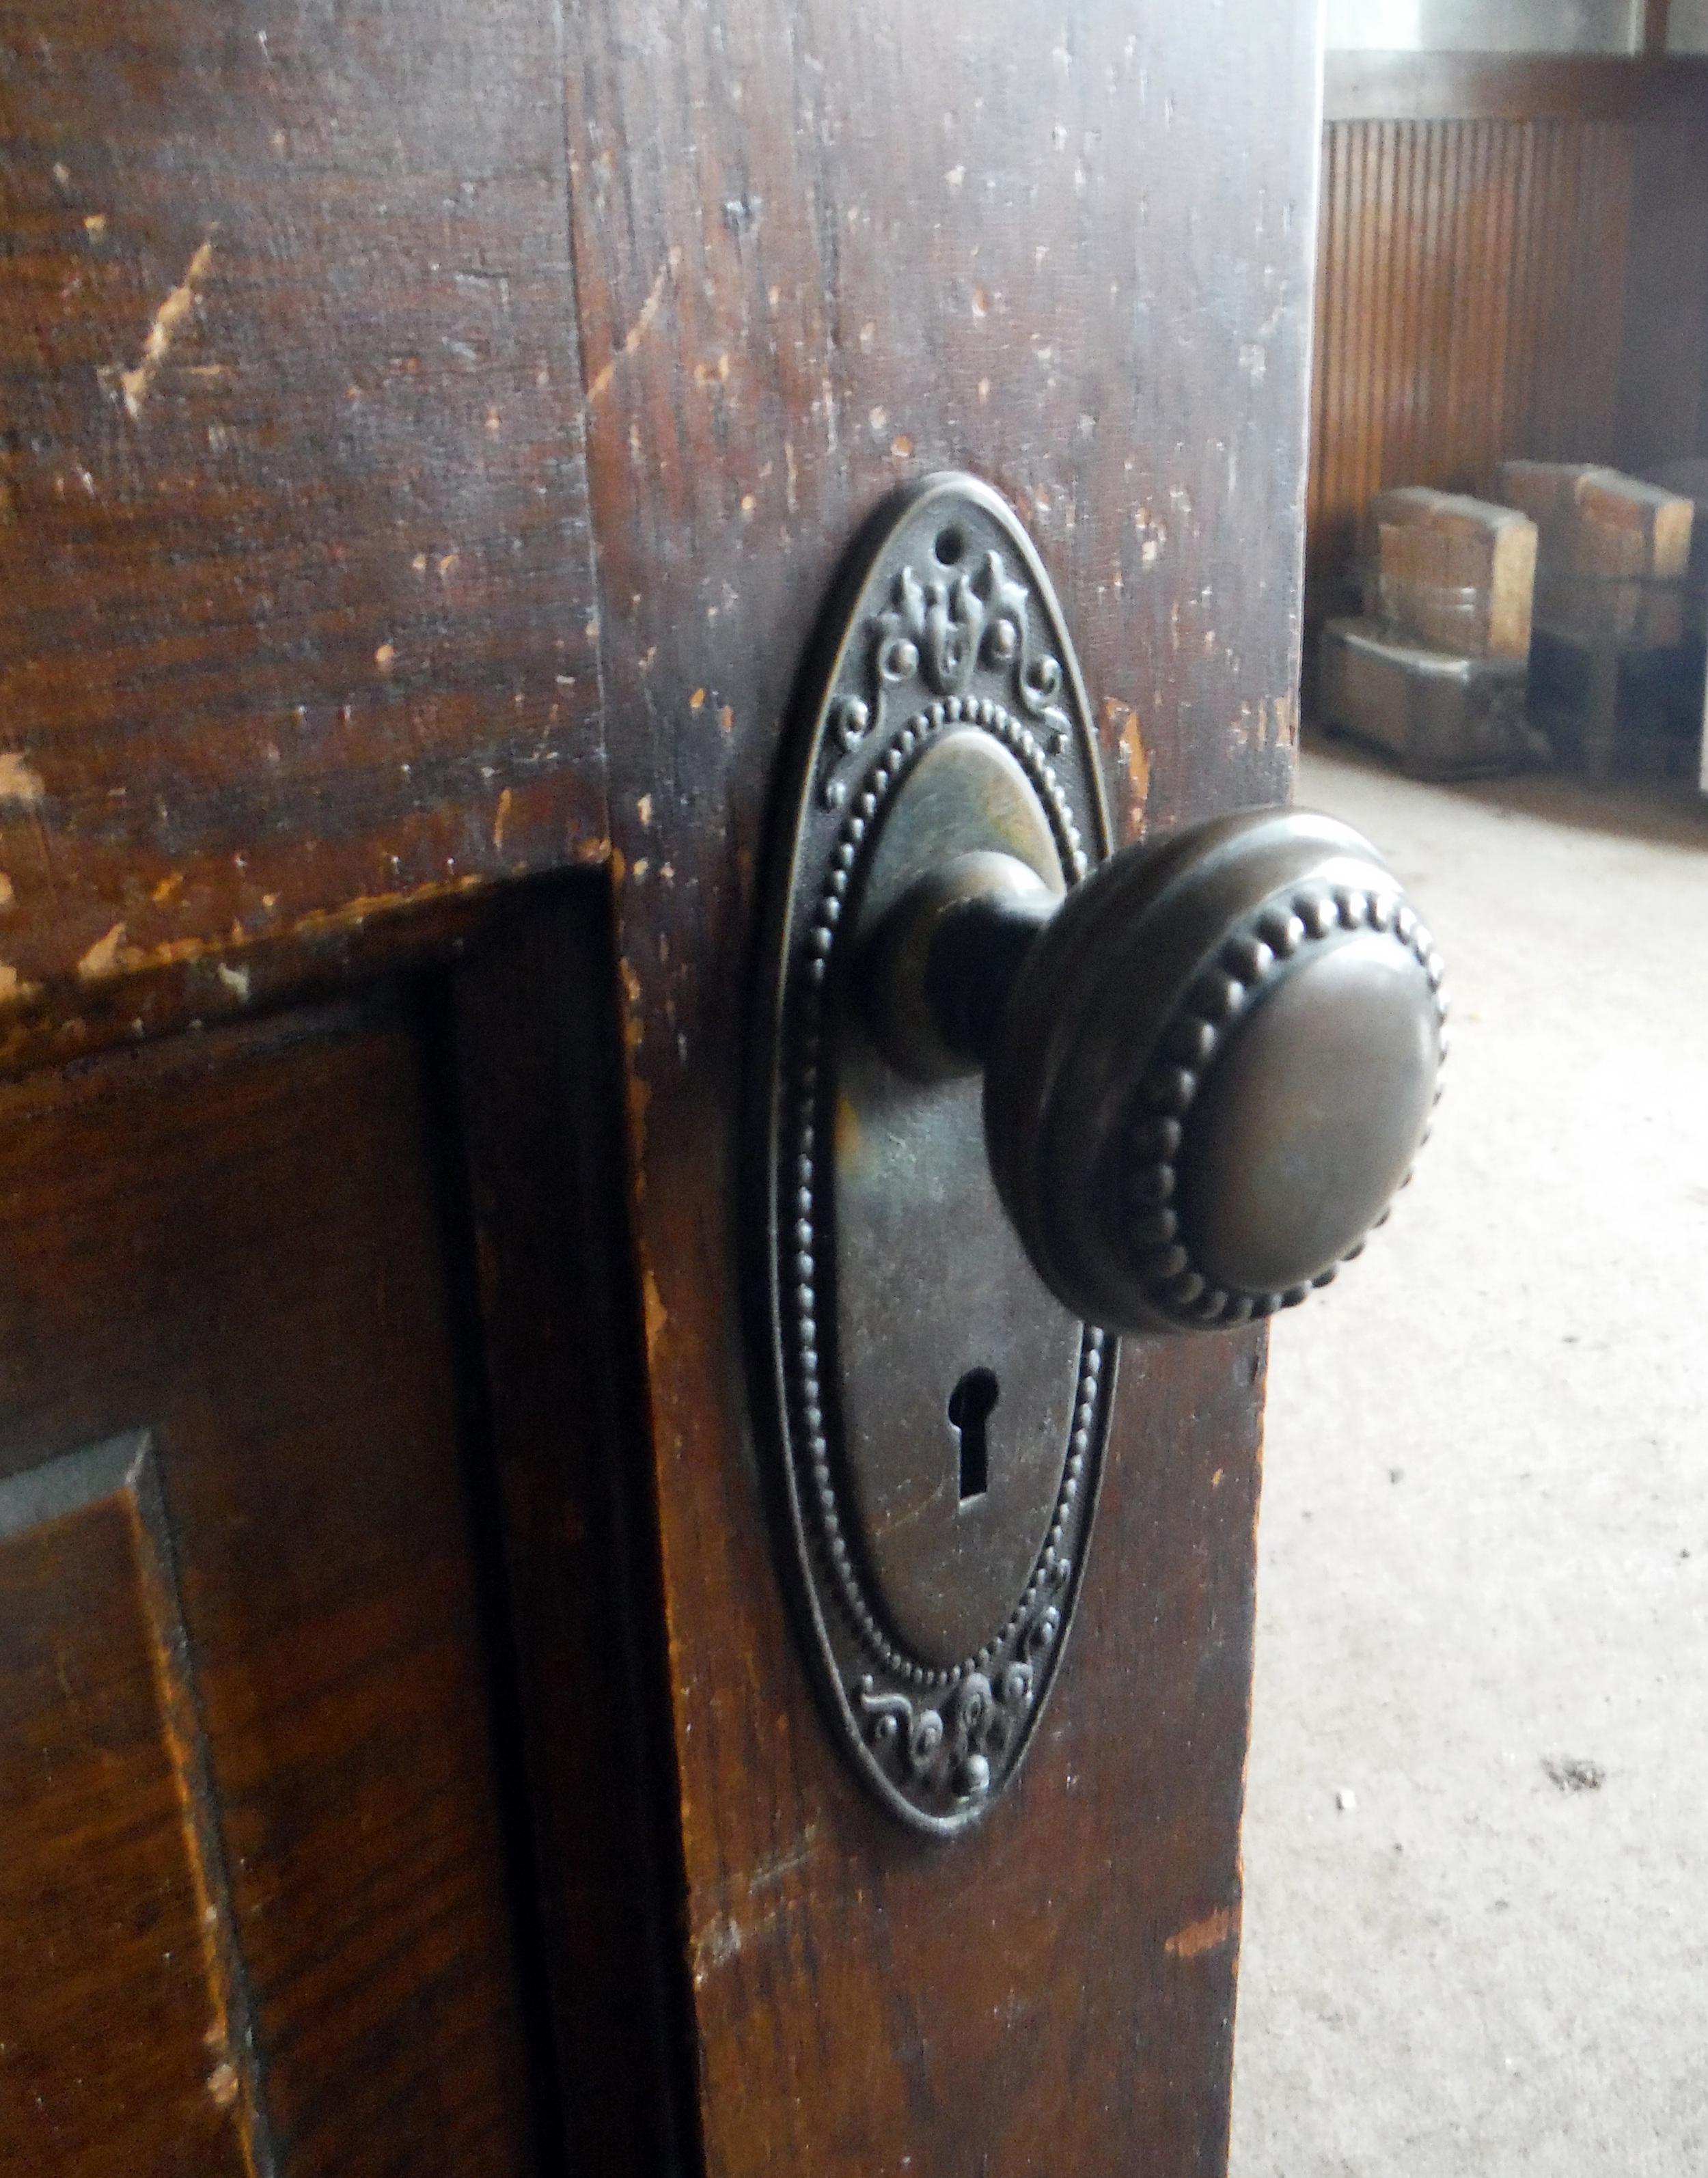 Original doorknob. Photo by Sydney Haltom, March 2015.